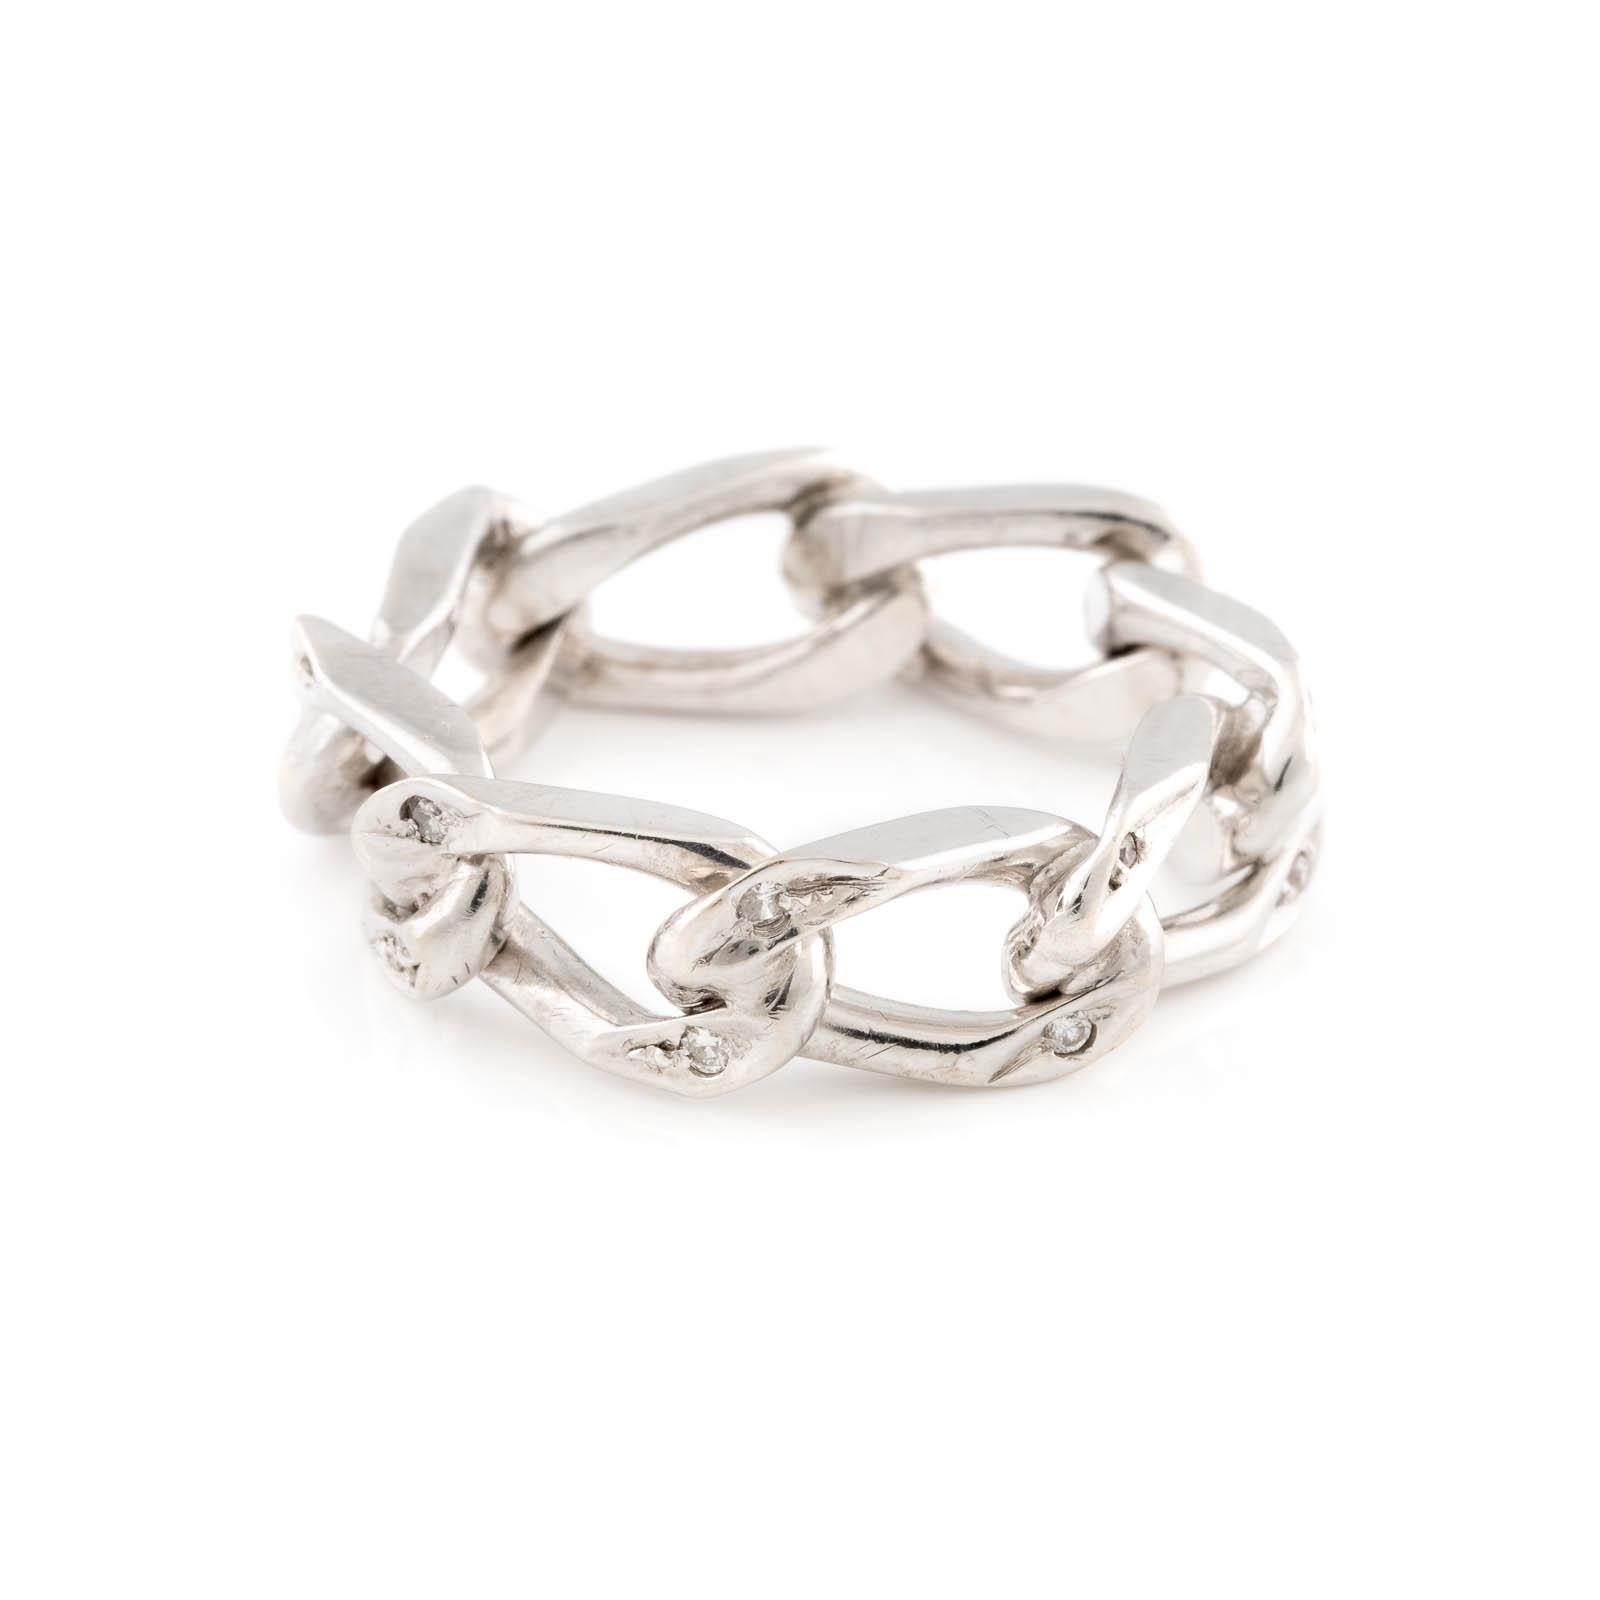 Lot 47 - DIAMANT-RING Weißgold. Ringmaß ca. 53, Ges.-Gew. ca. 6,1 g. Geprüft 14 K. 16 Diamanten im